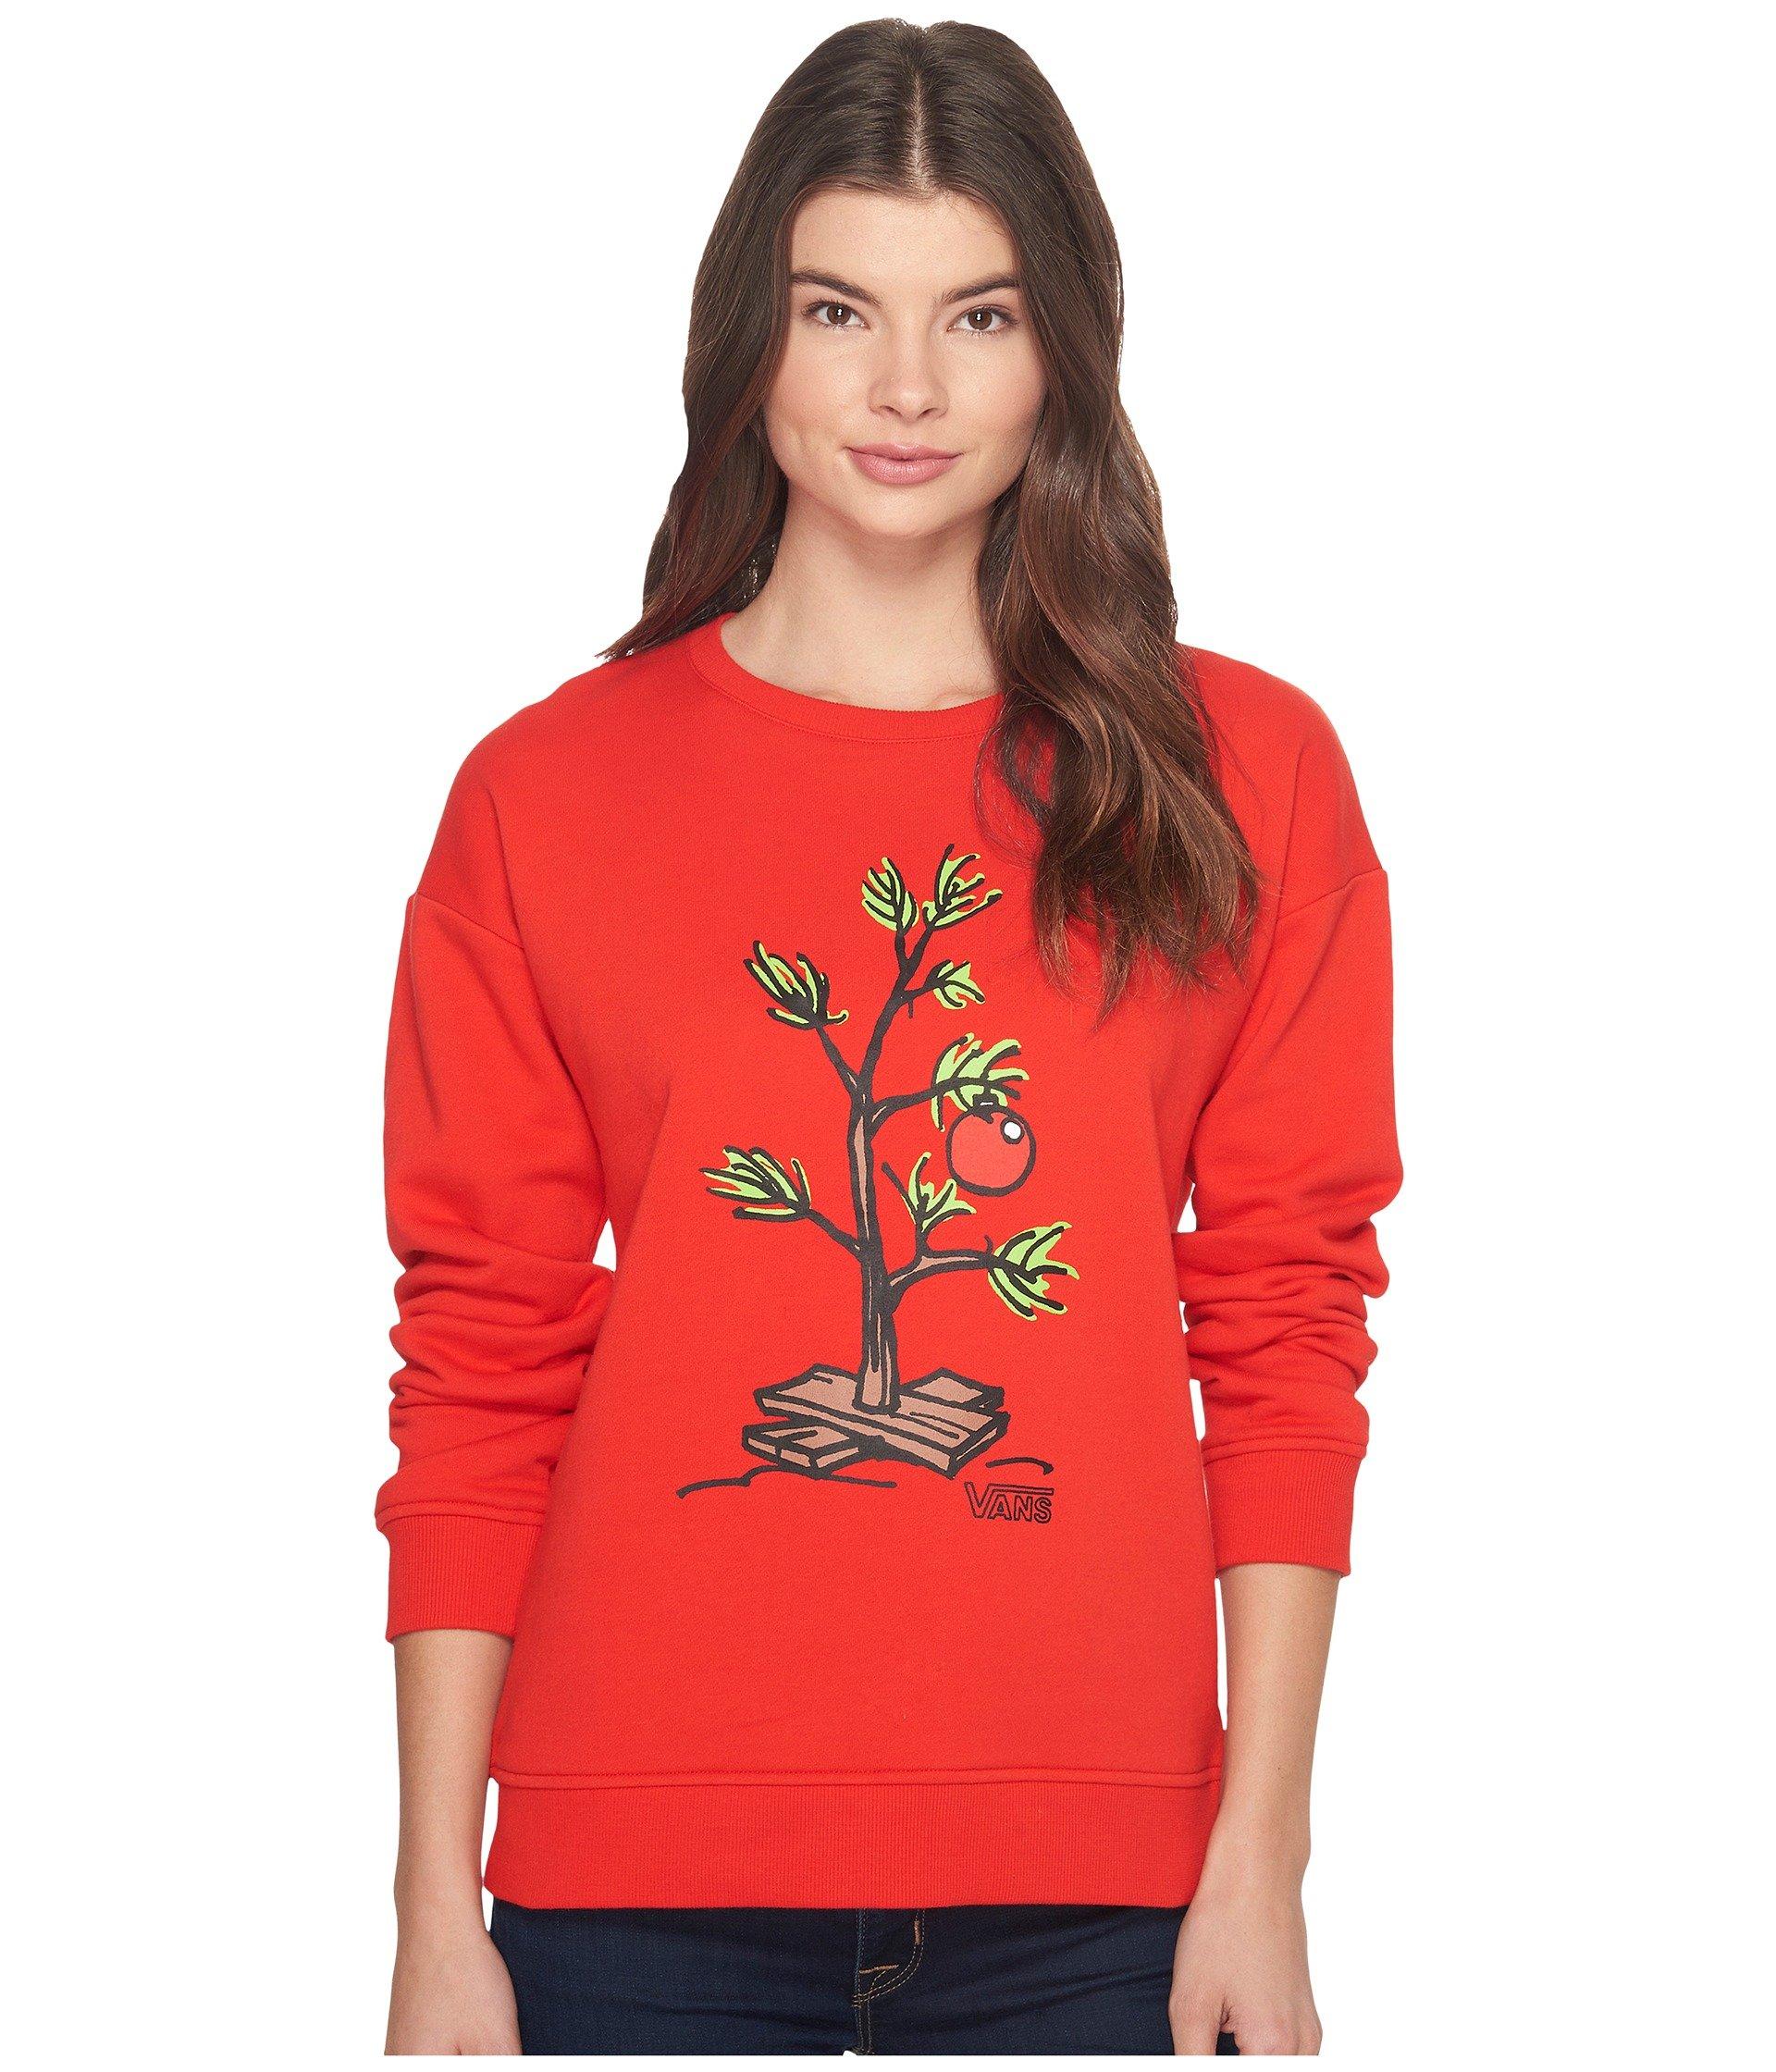 Peanuts Christmas Tree Crew